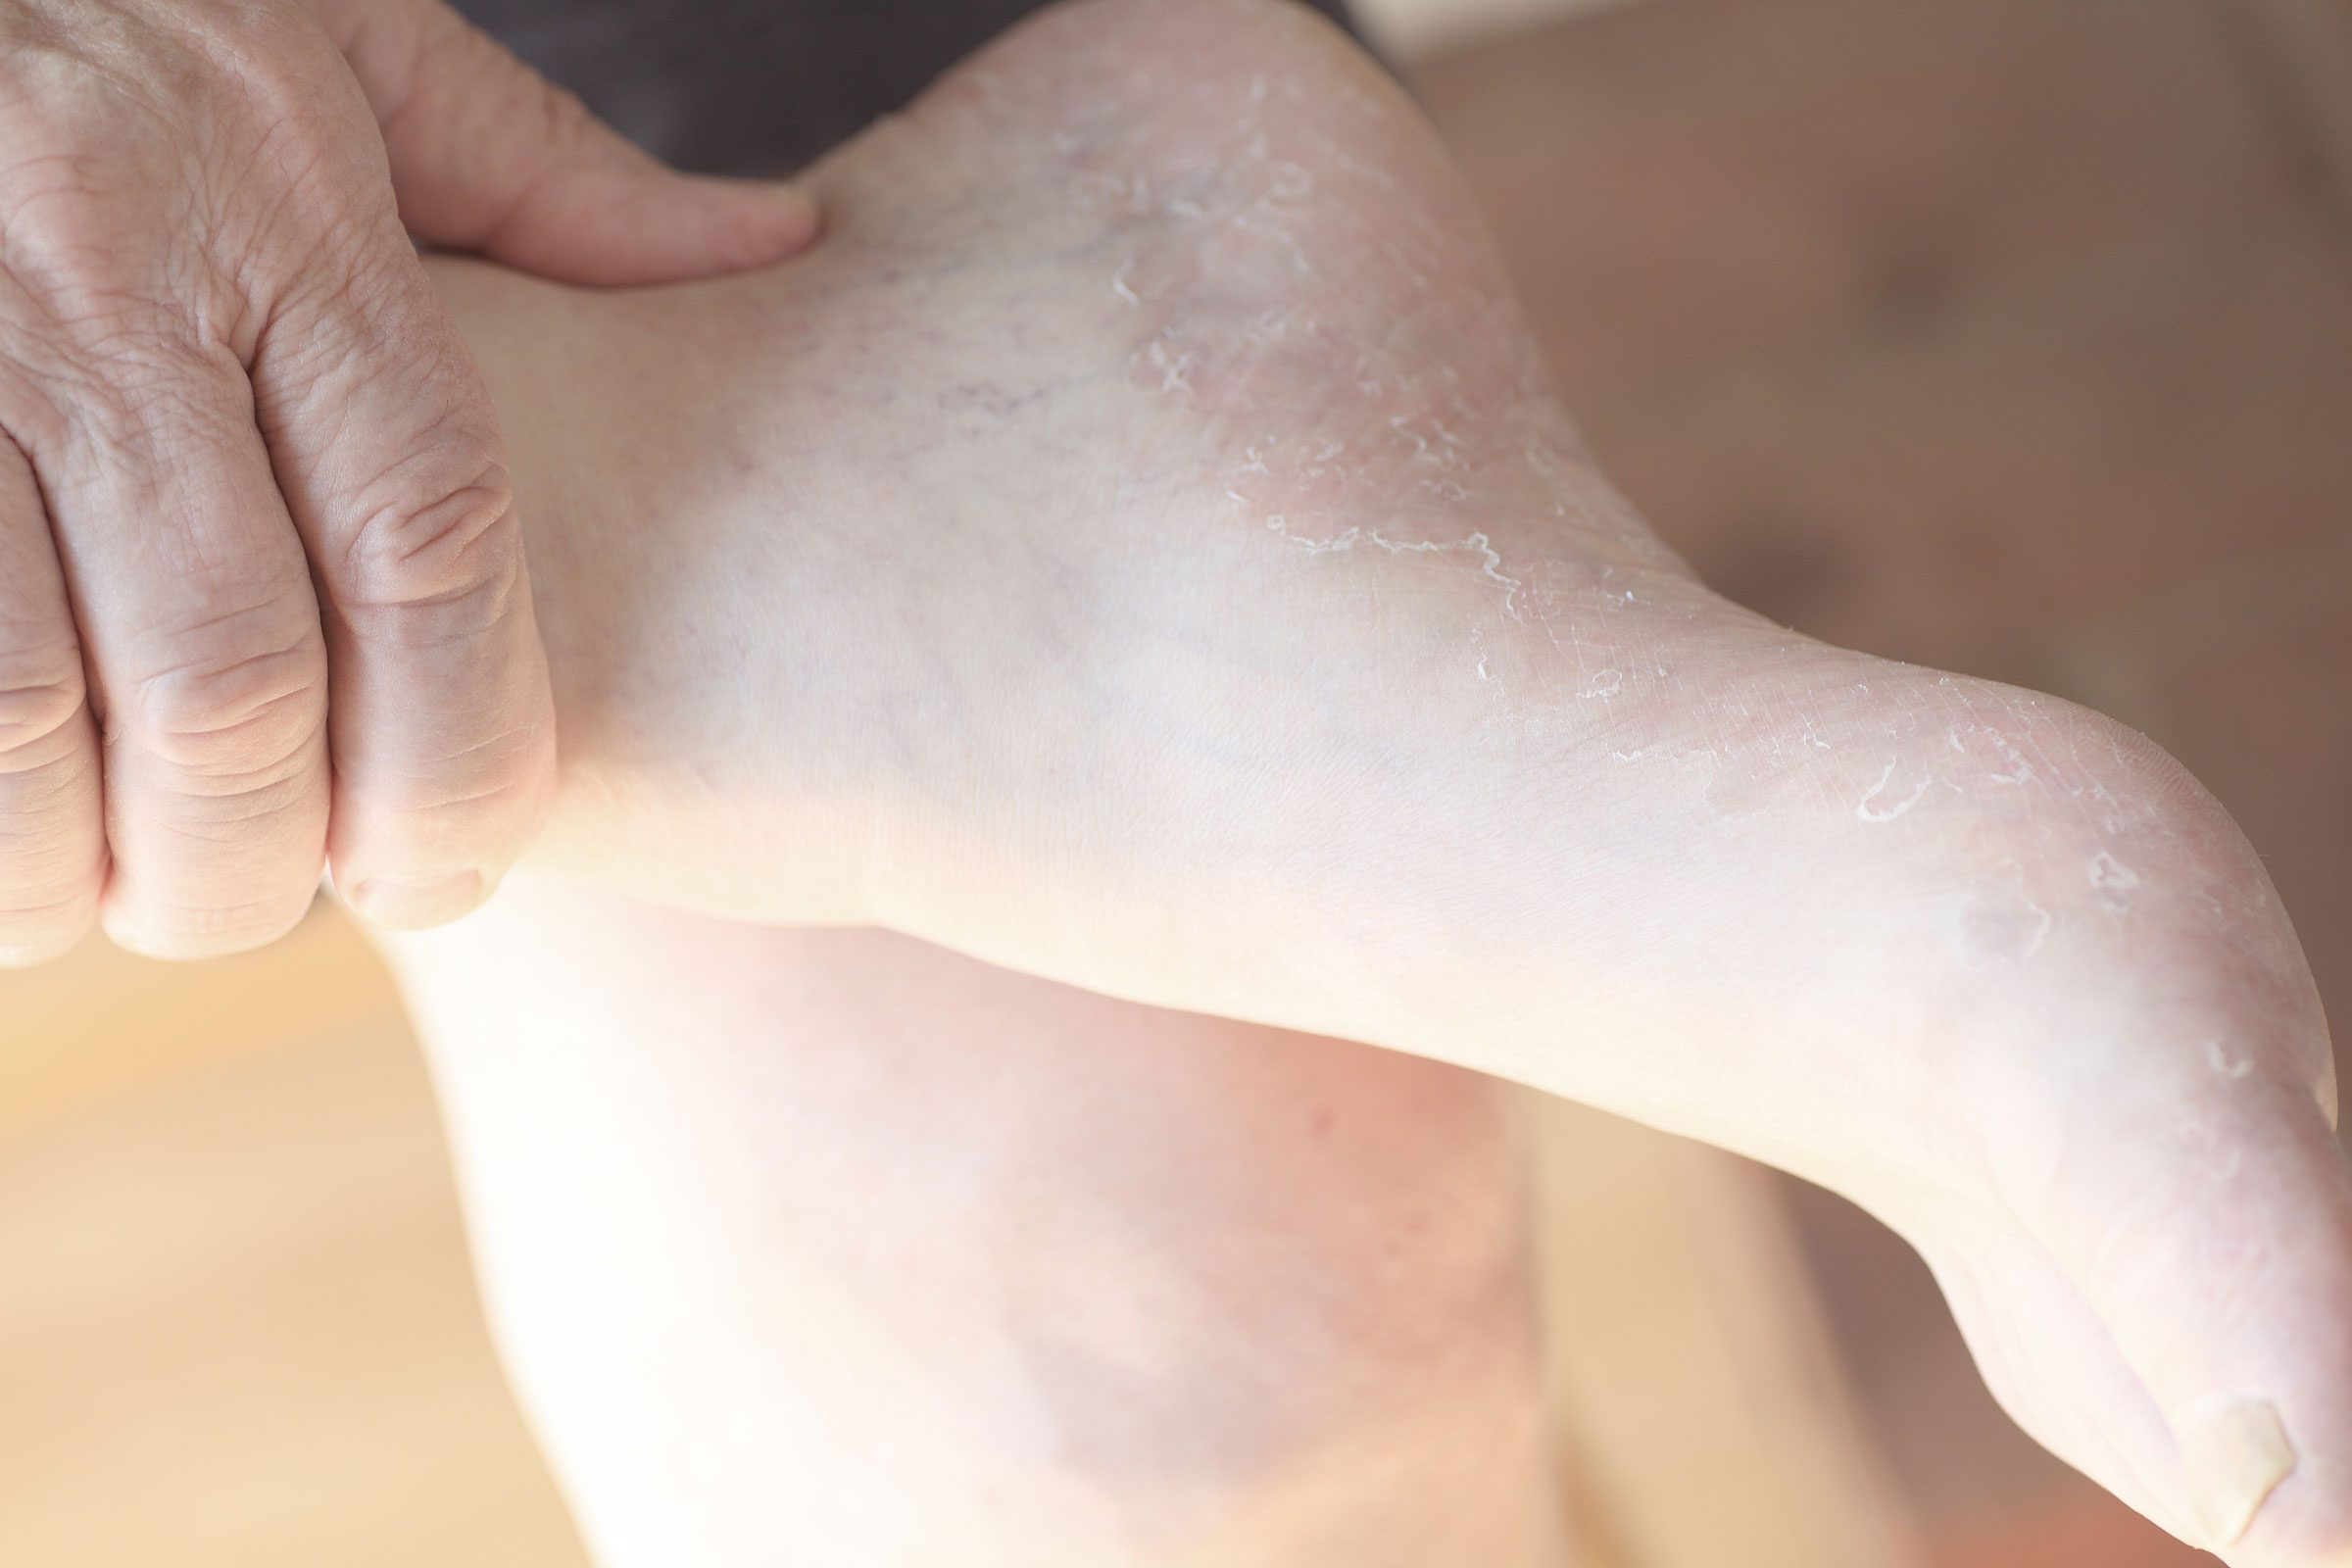 You notice: Dry, flaky feet